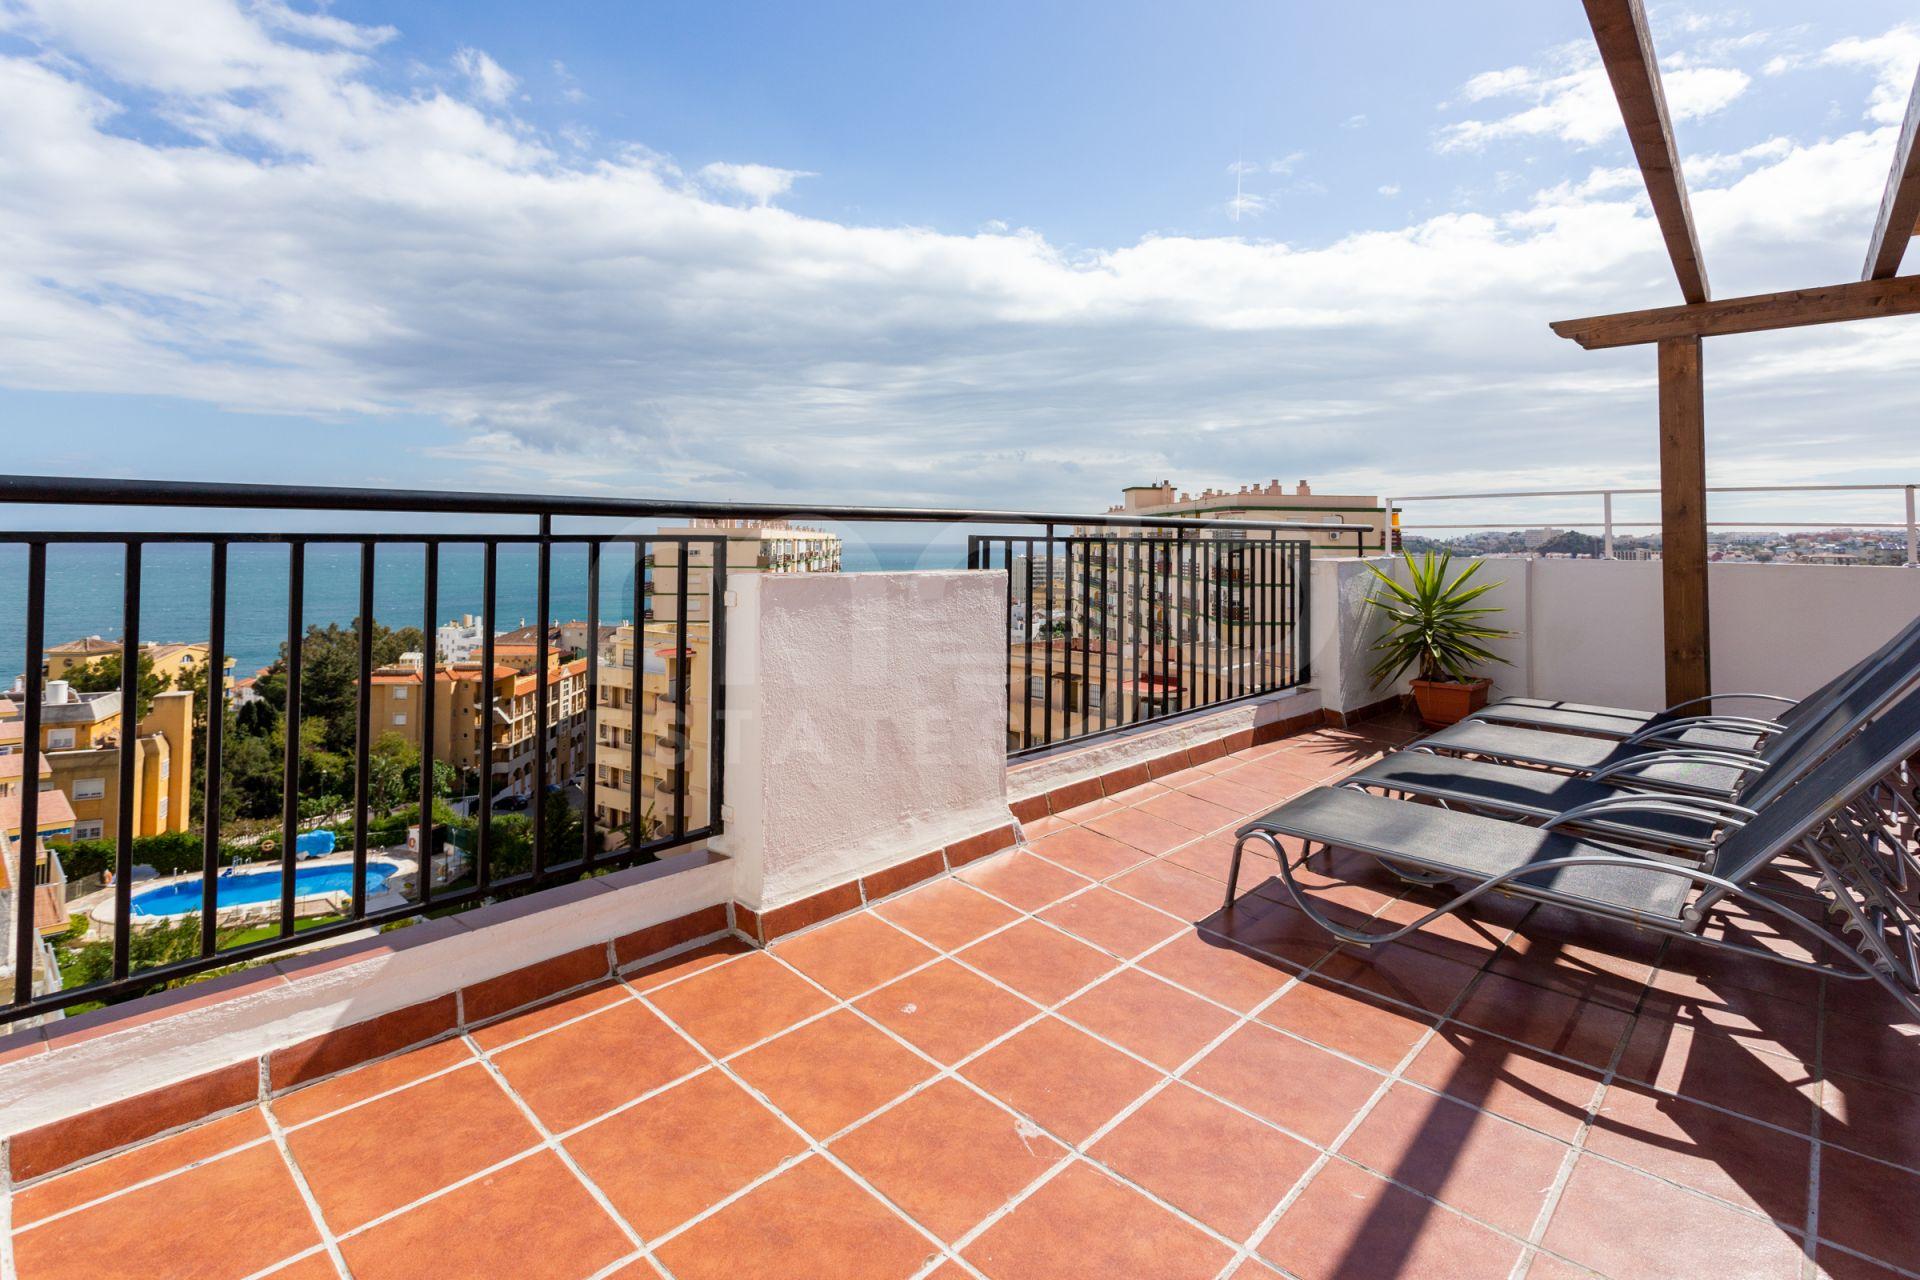 Fabulous penthouse within an excellent location in Benalmadena, Arroyo de la Miel.